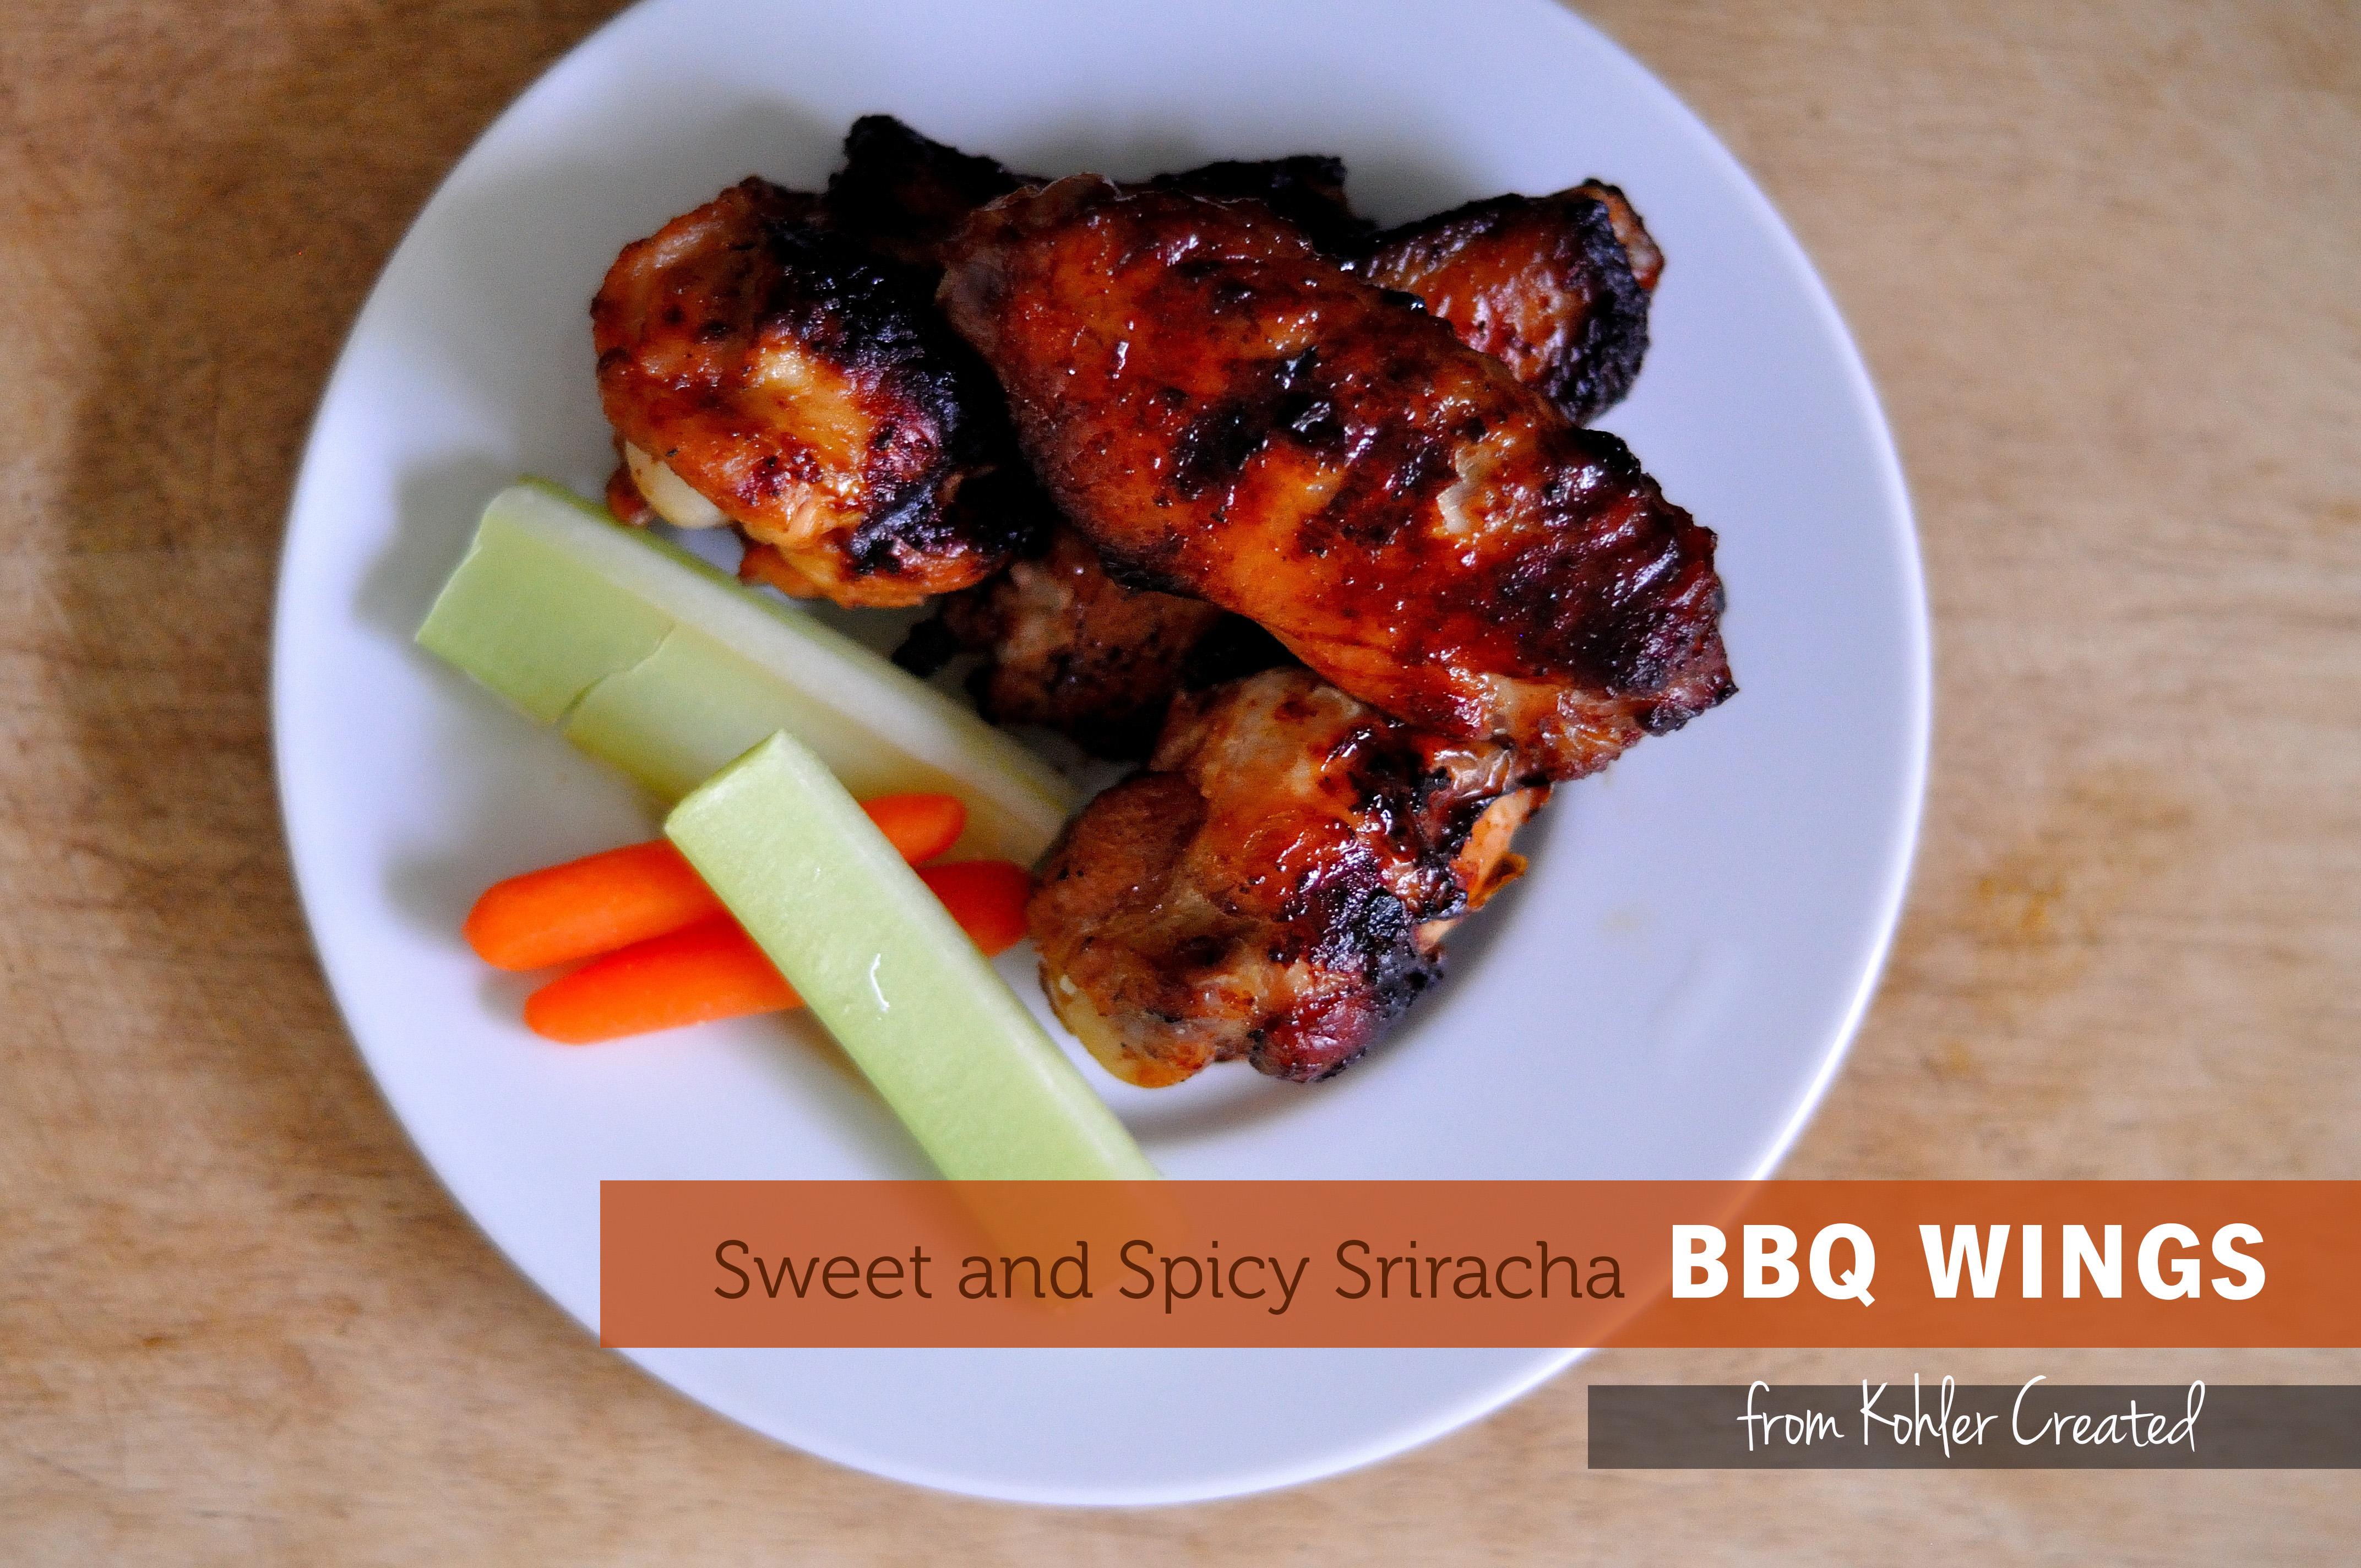 Sweet and Spicy Sriracha BBQ Wings - Kohler Created